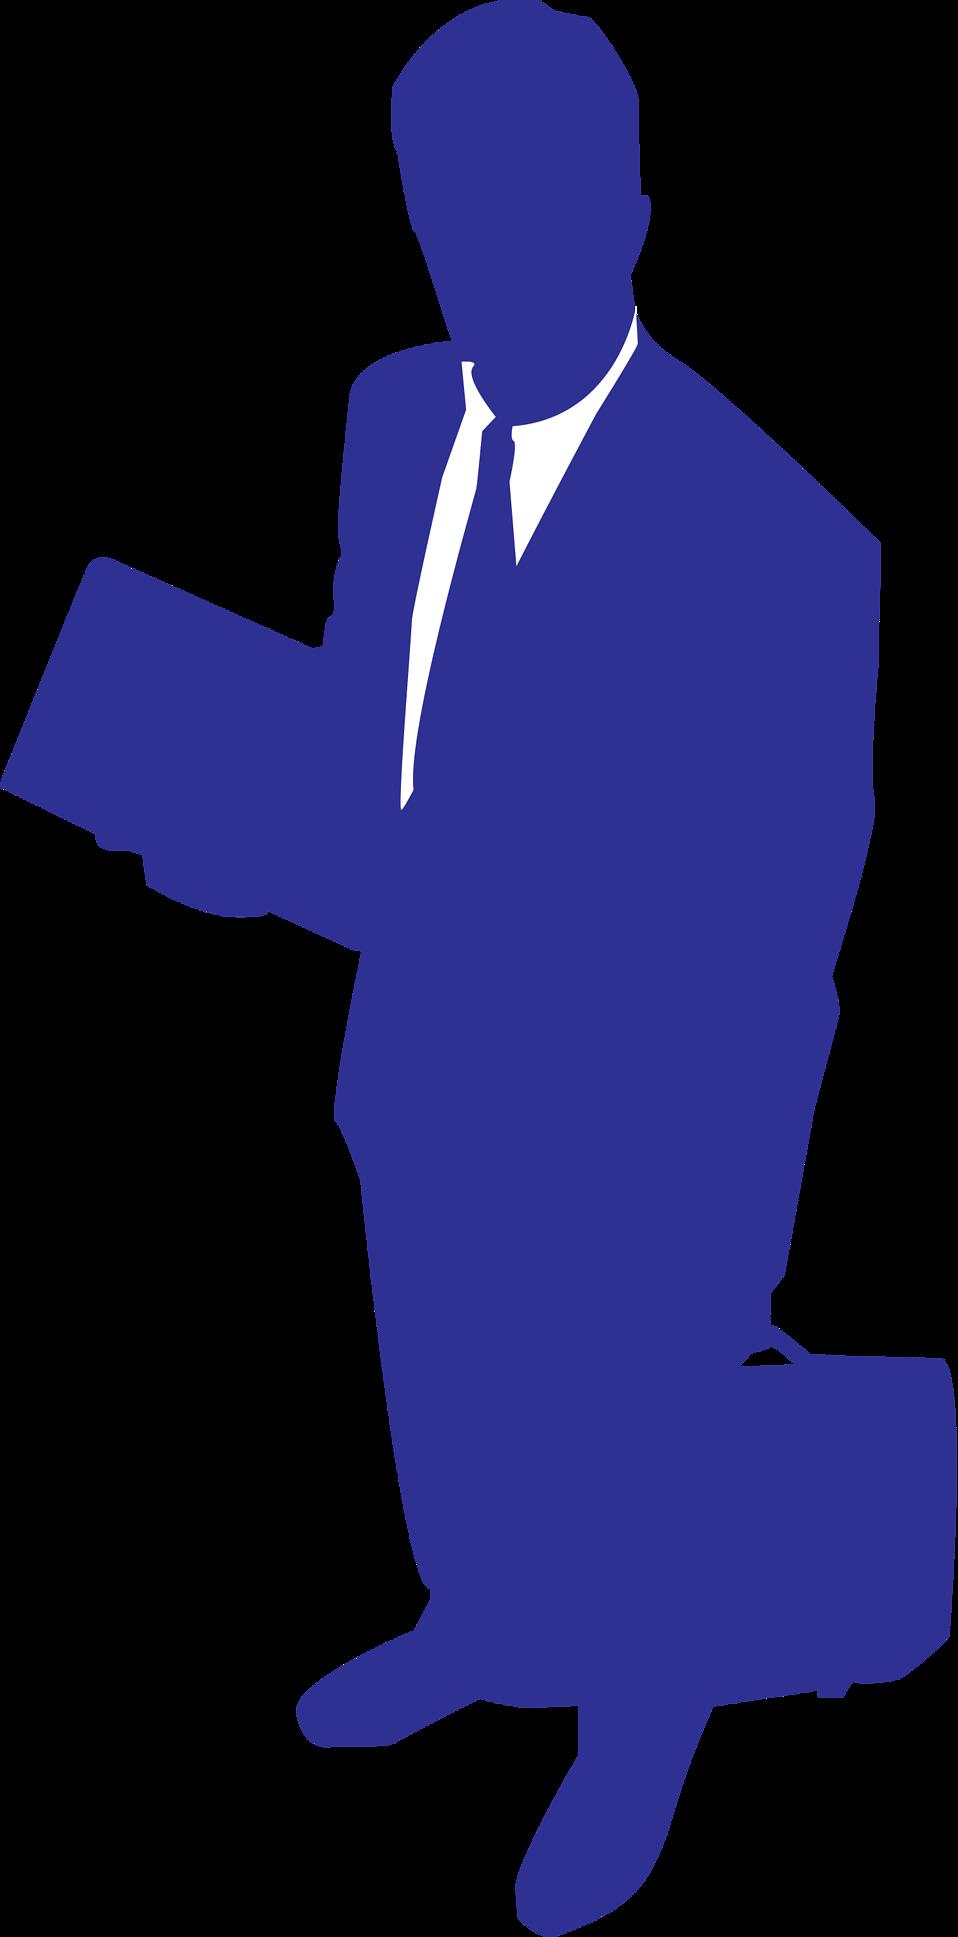 Illustration of a man. Motivation clipart business